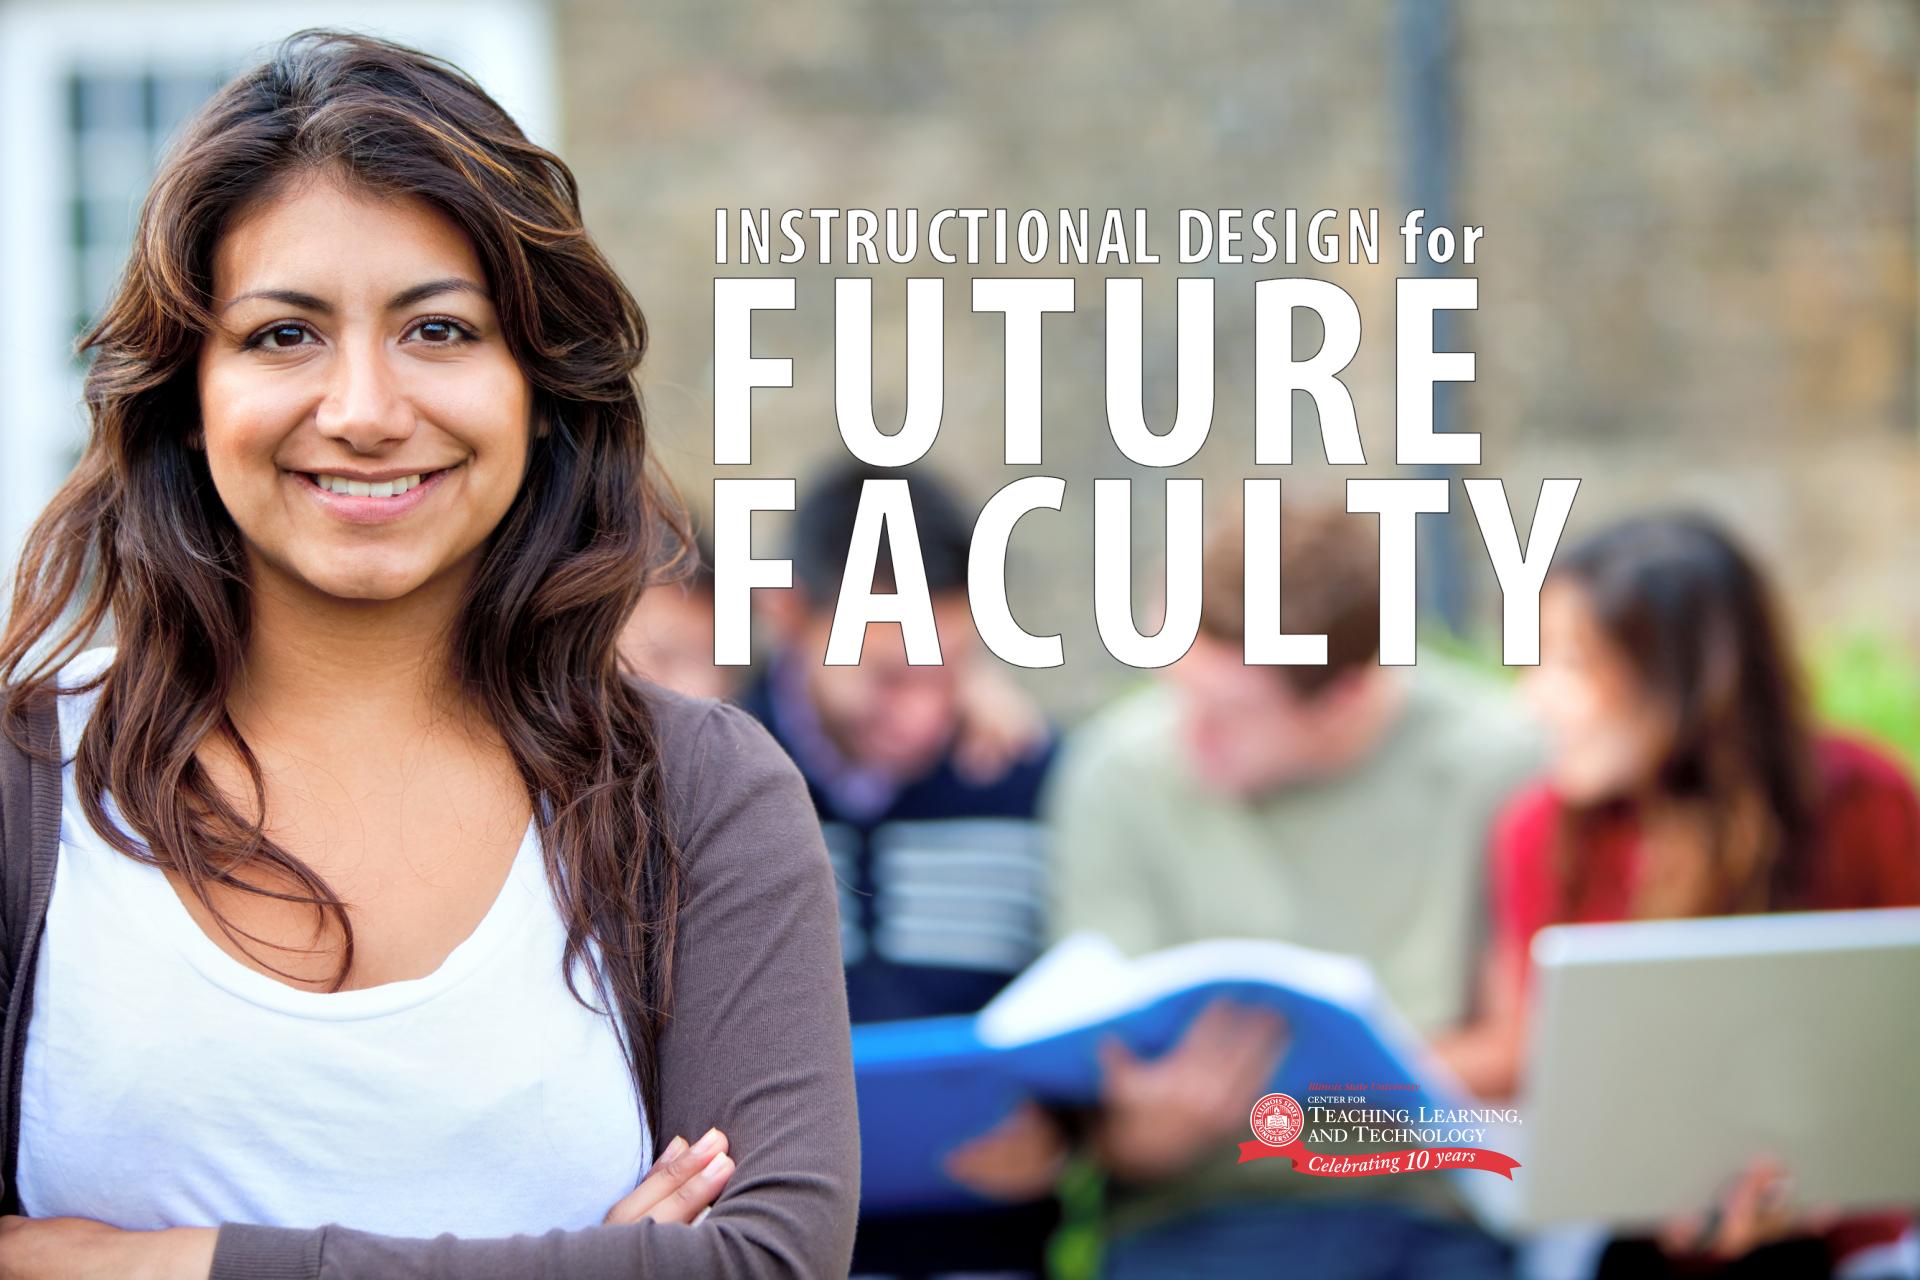 Future Faculty